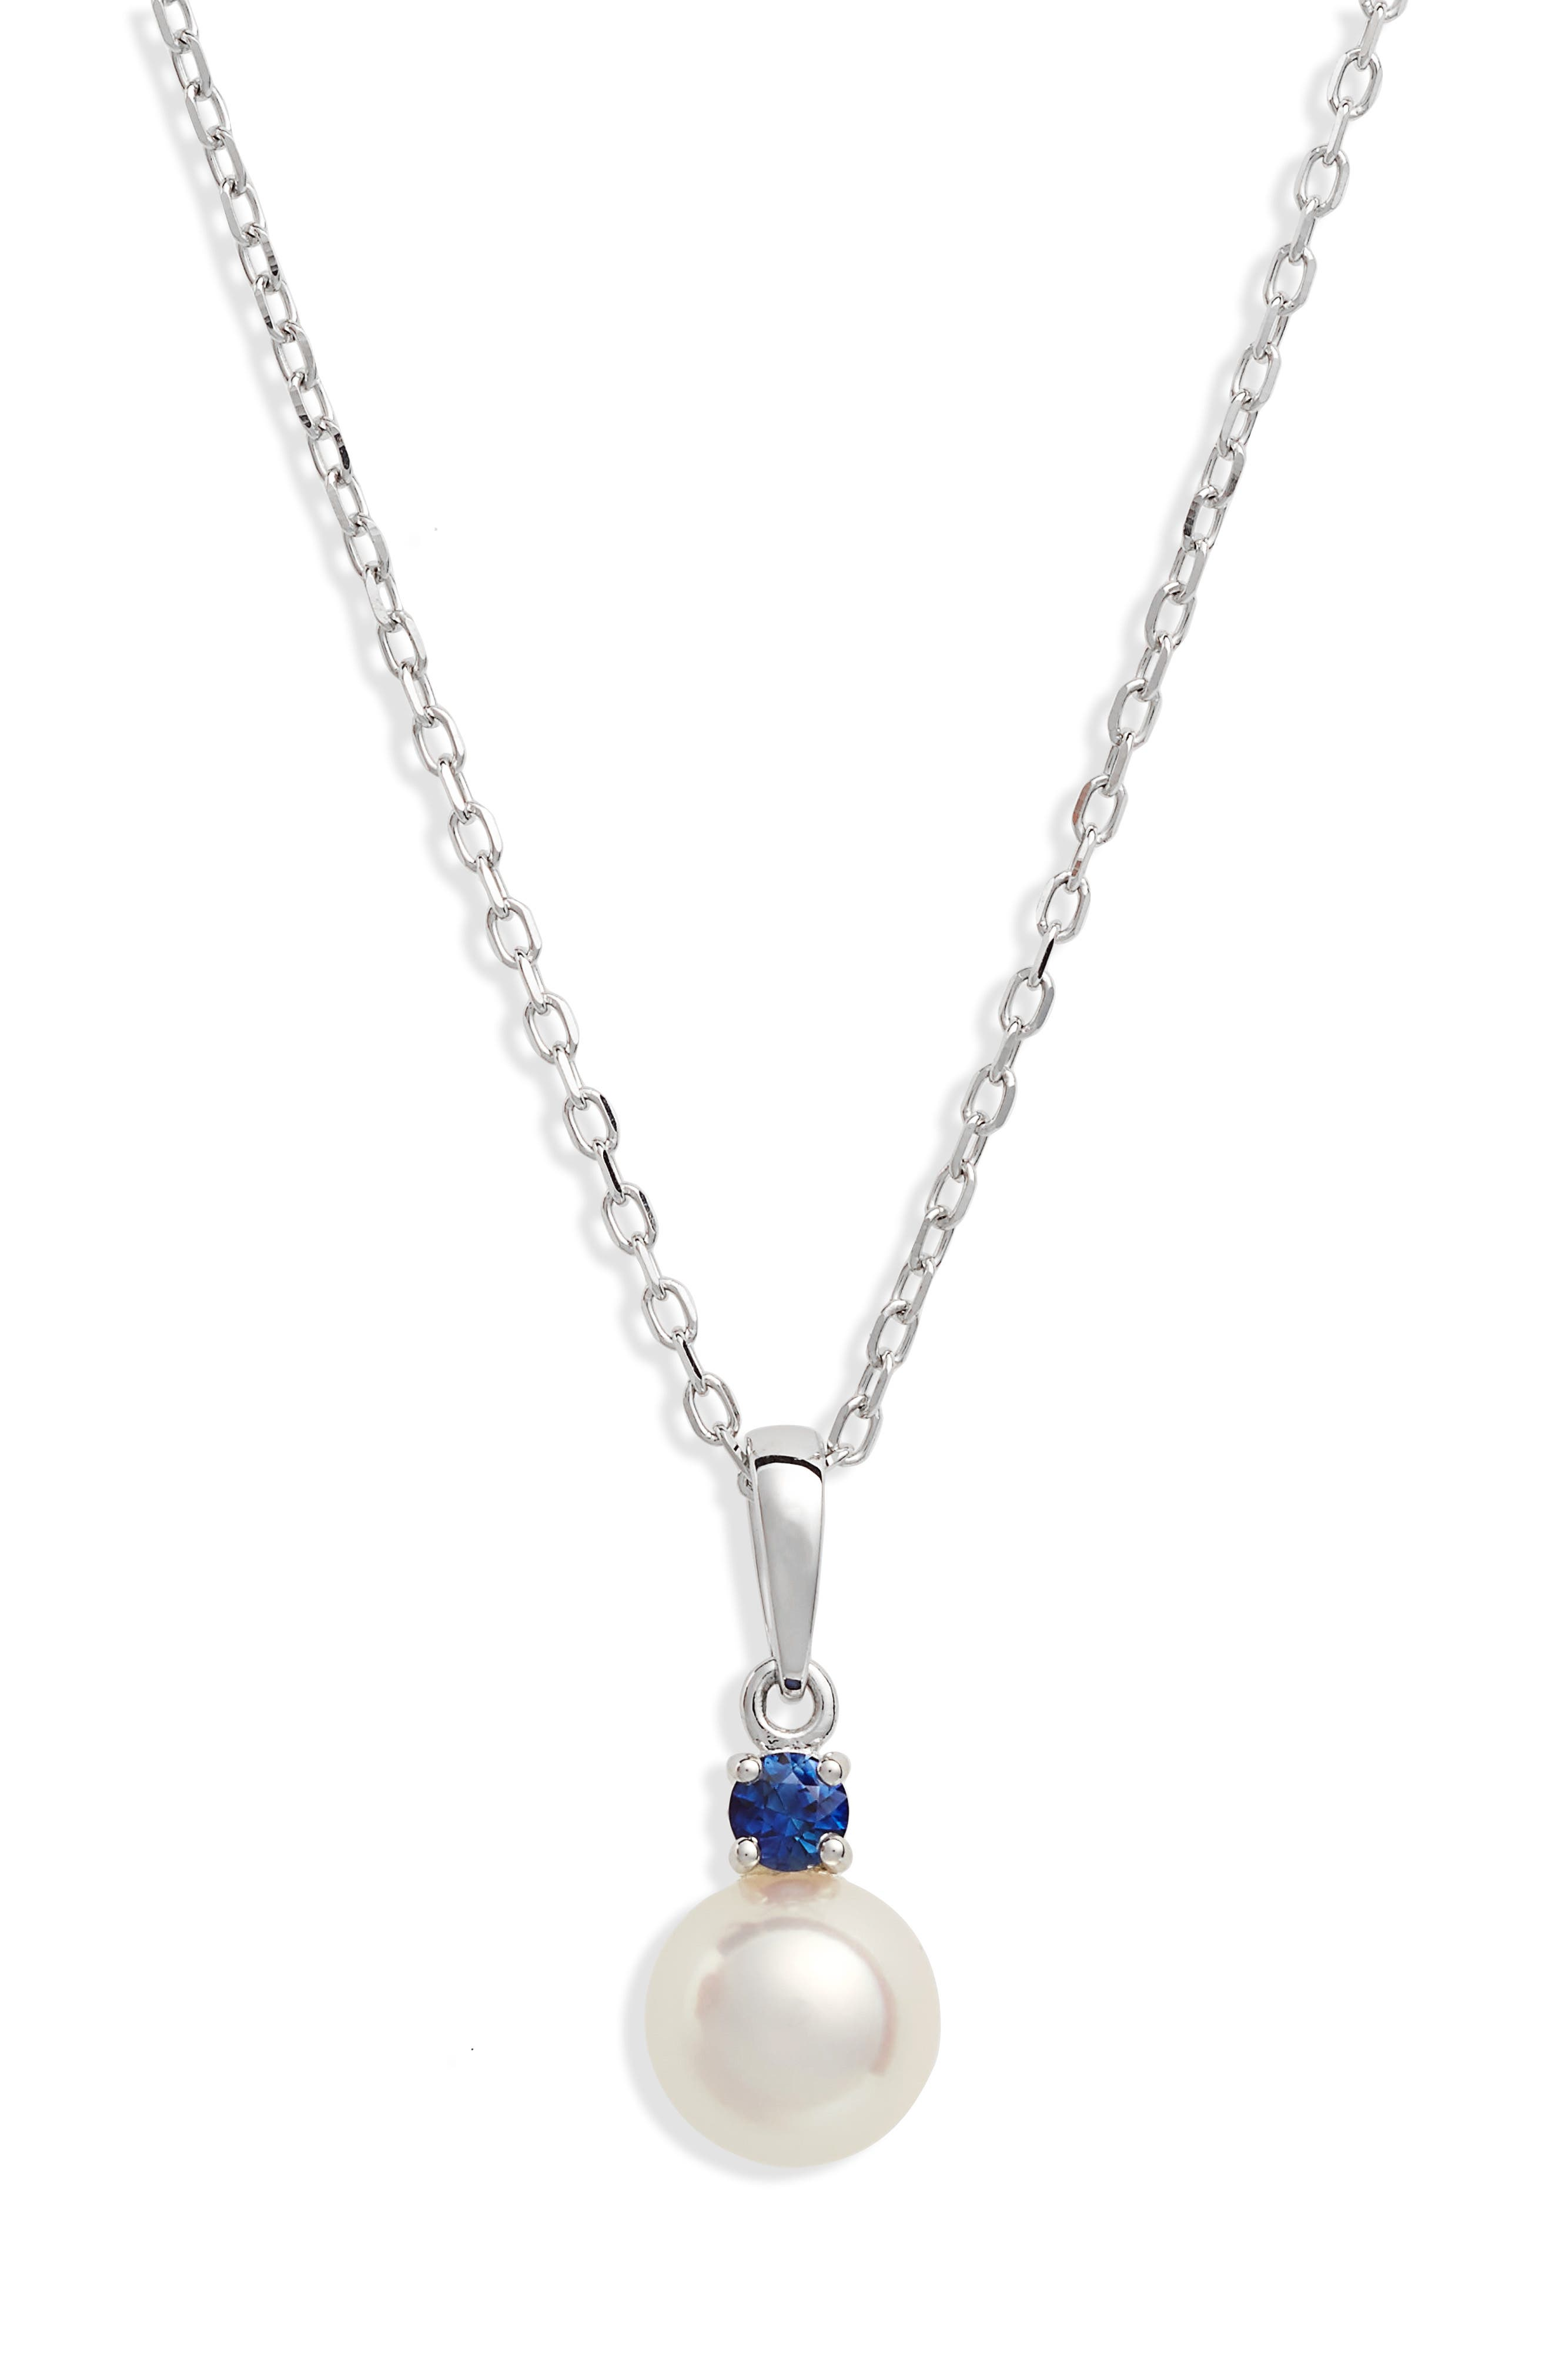 Mikimoto Akoya Cultured Pearl & Sapphire Pendant Necklace